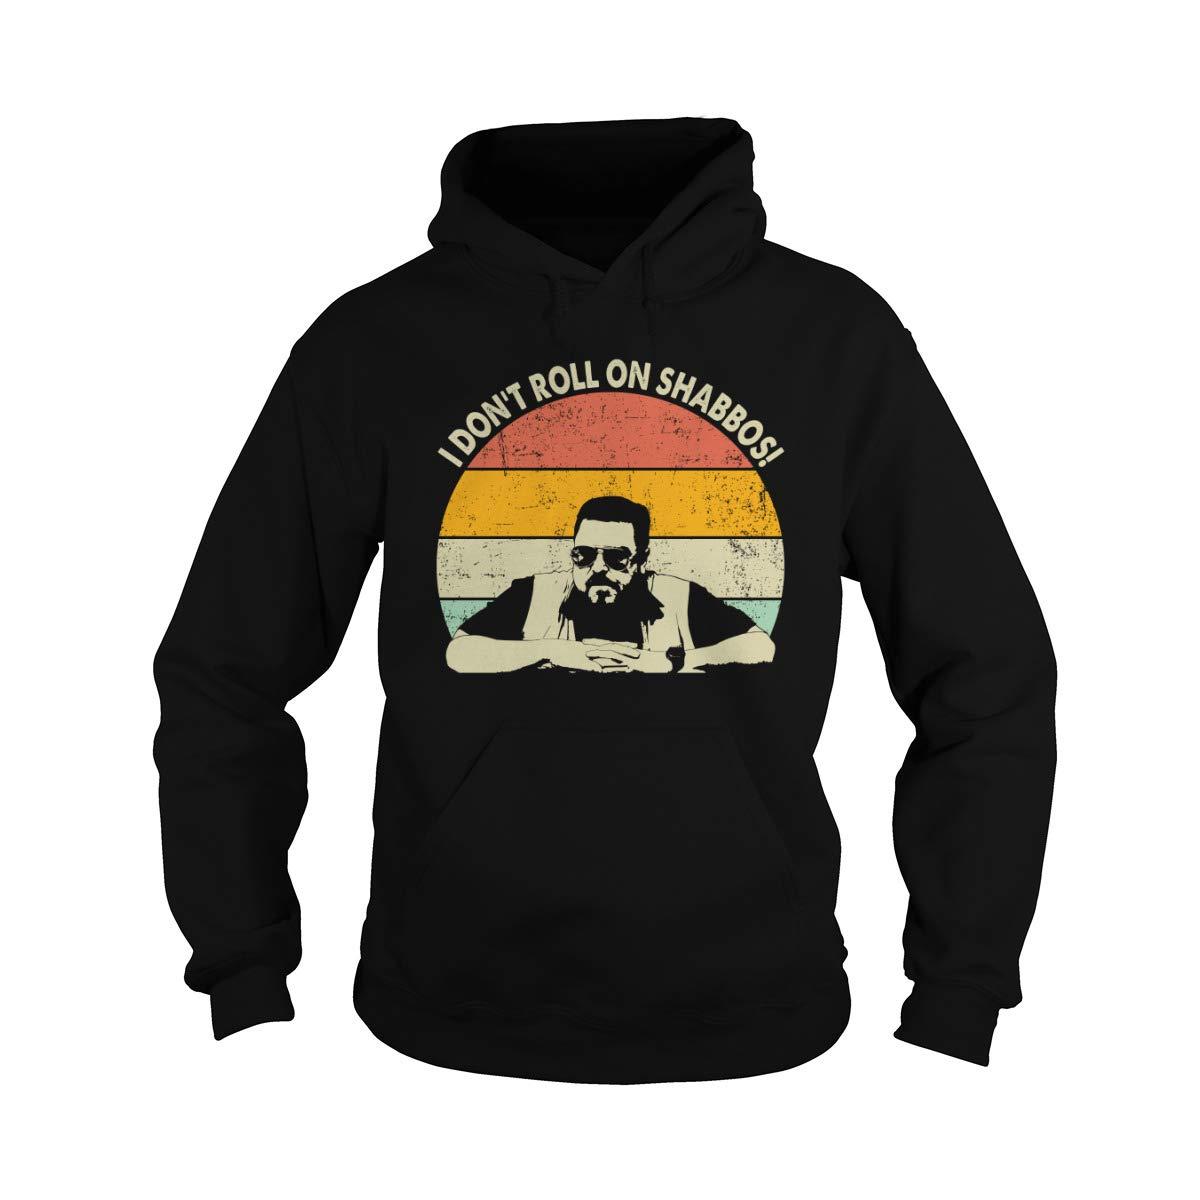 I Dont Roll On Shabbos Vintage Adult Hooded Sweatshirt